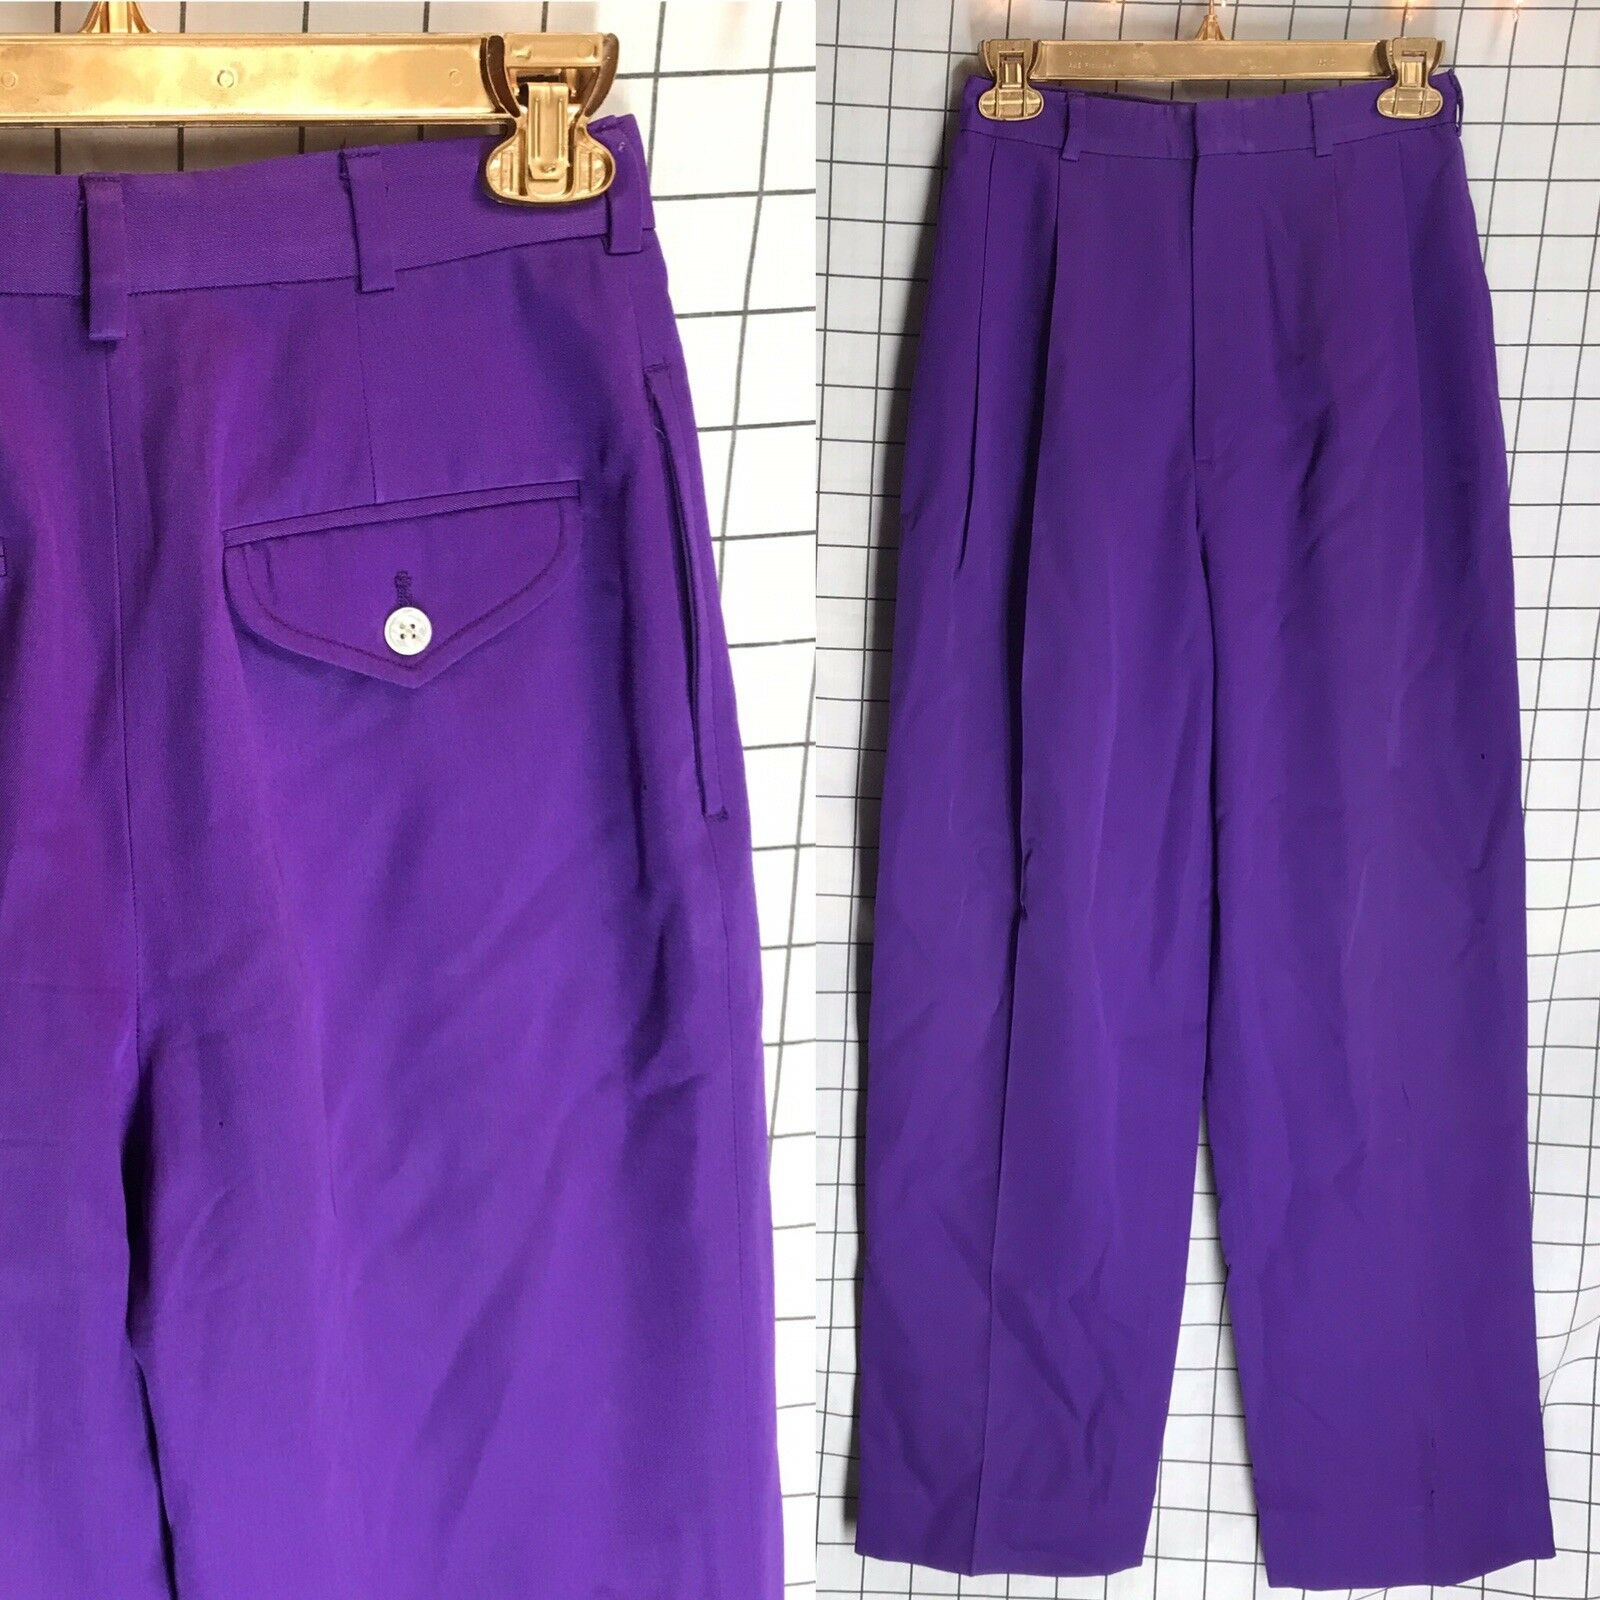 Vintage Ralph Lauren bluee Label Size 4 Wide Leg Purple Pants High Waist Women's